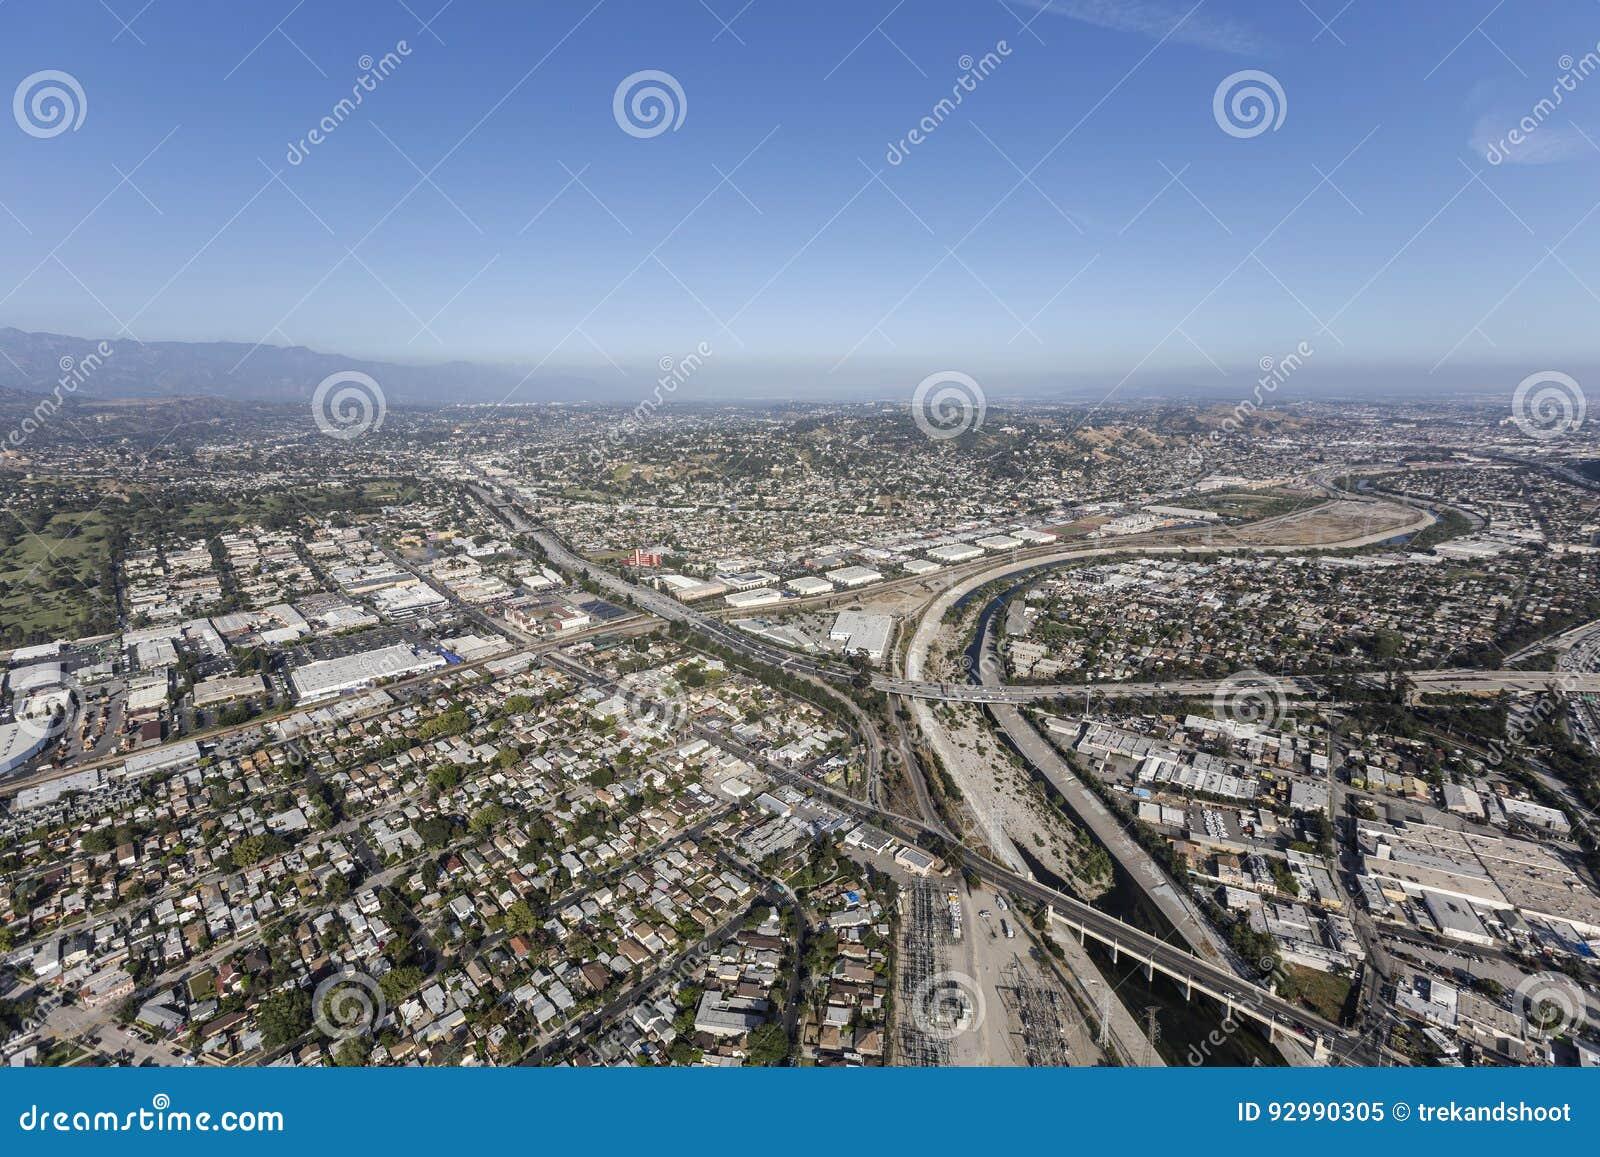 Los Angeles-Fluss an der Glendale-Autobahn